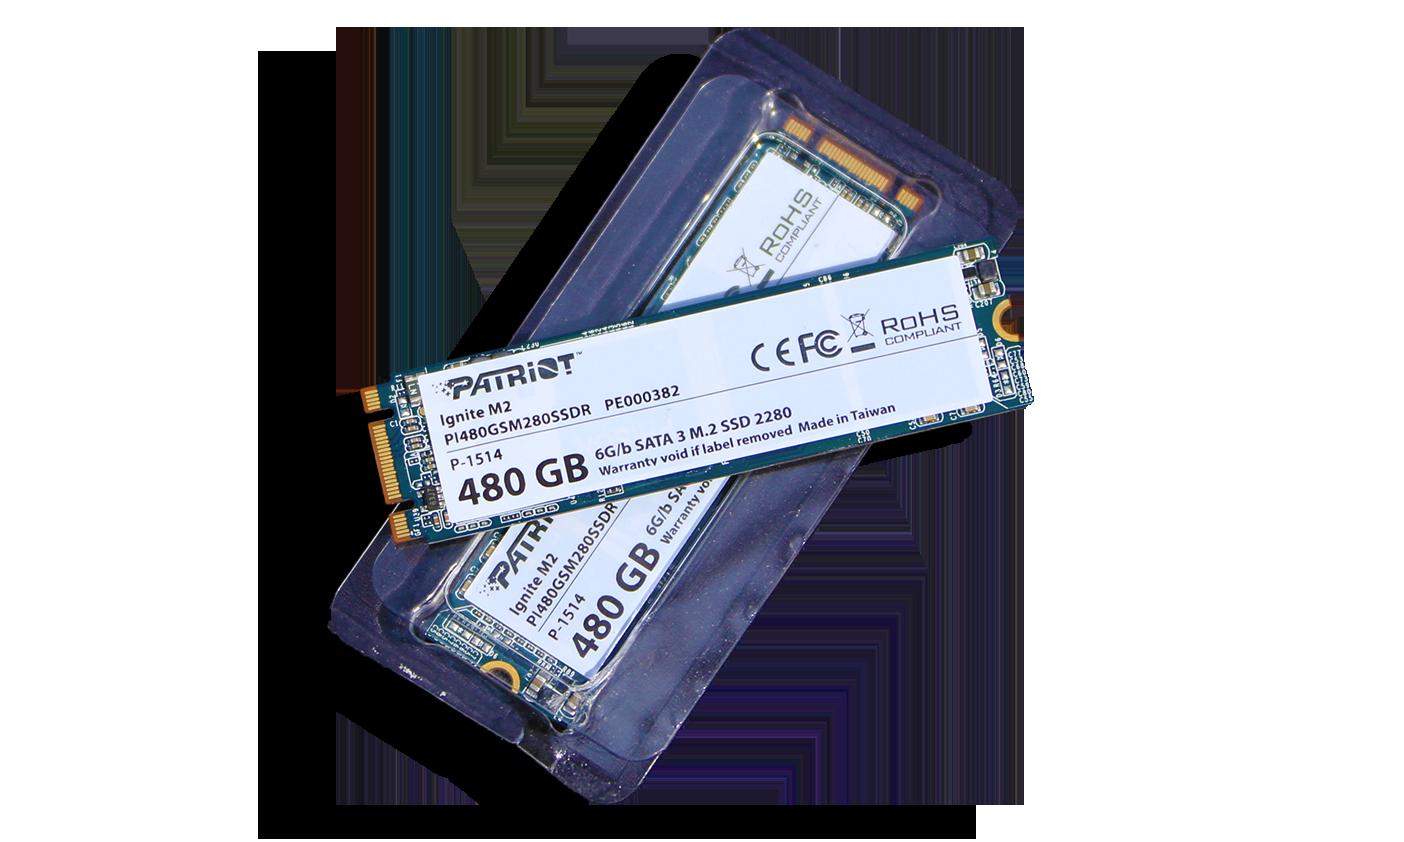 Patriot Ignite M2 SSD Closer